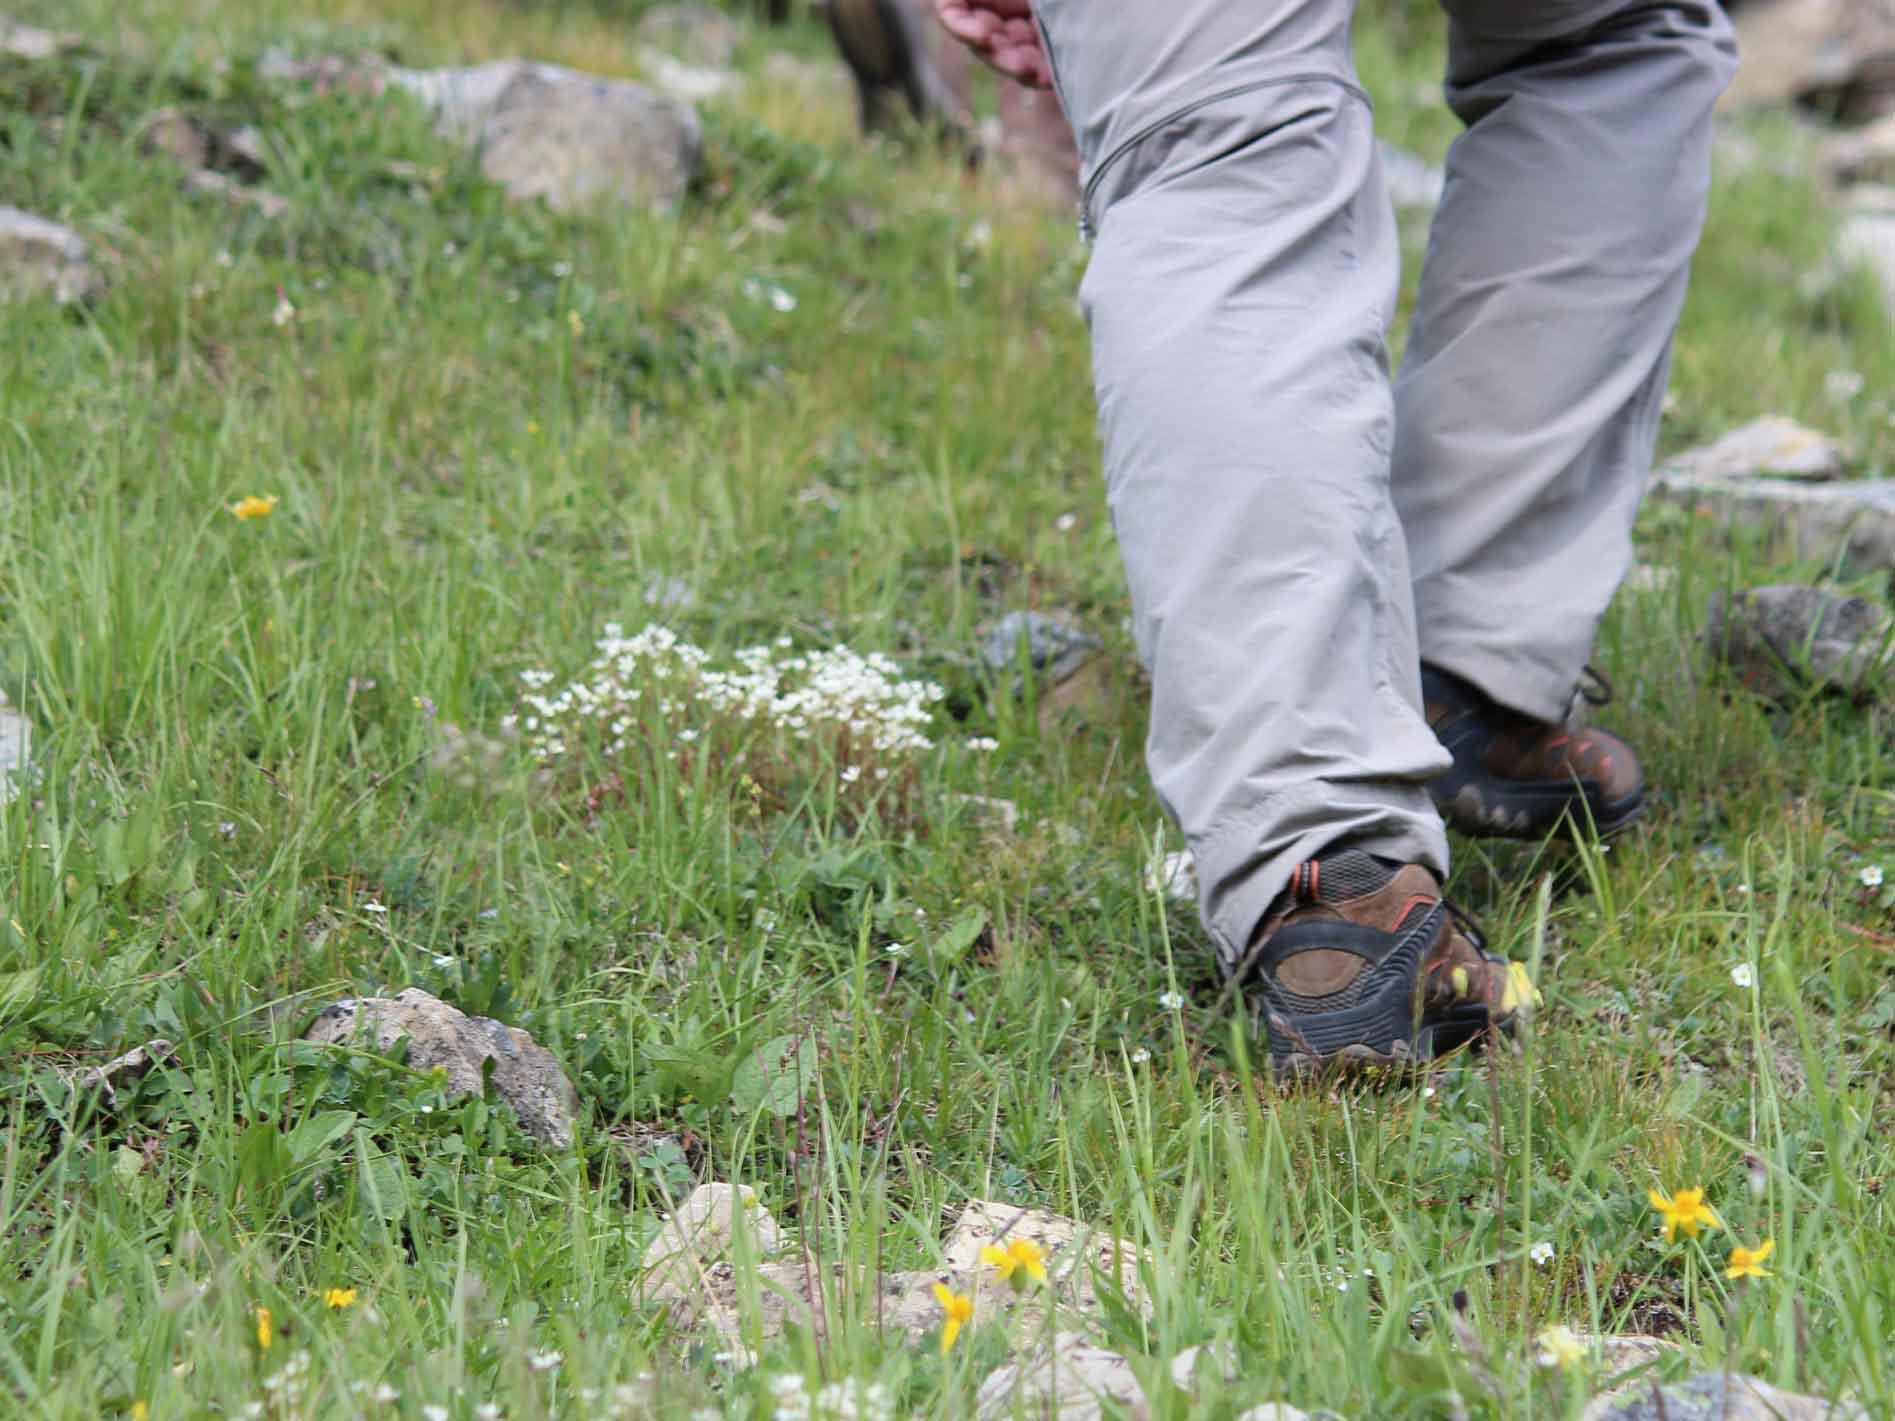 White Mountain Adventures Heli-Hike walking on grass